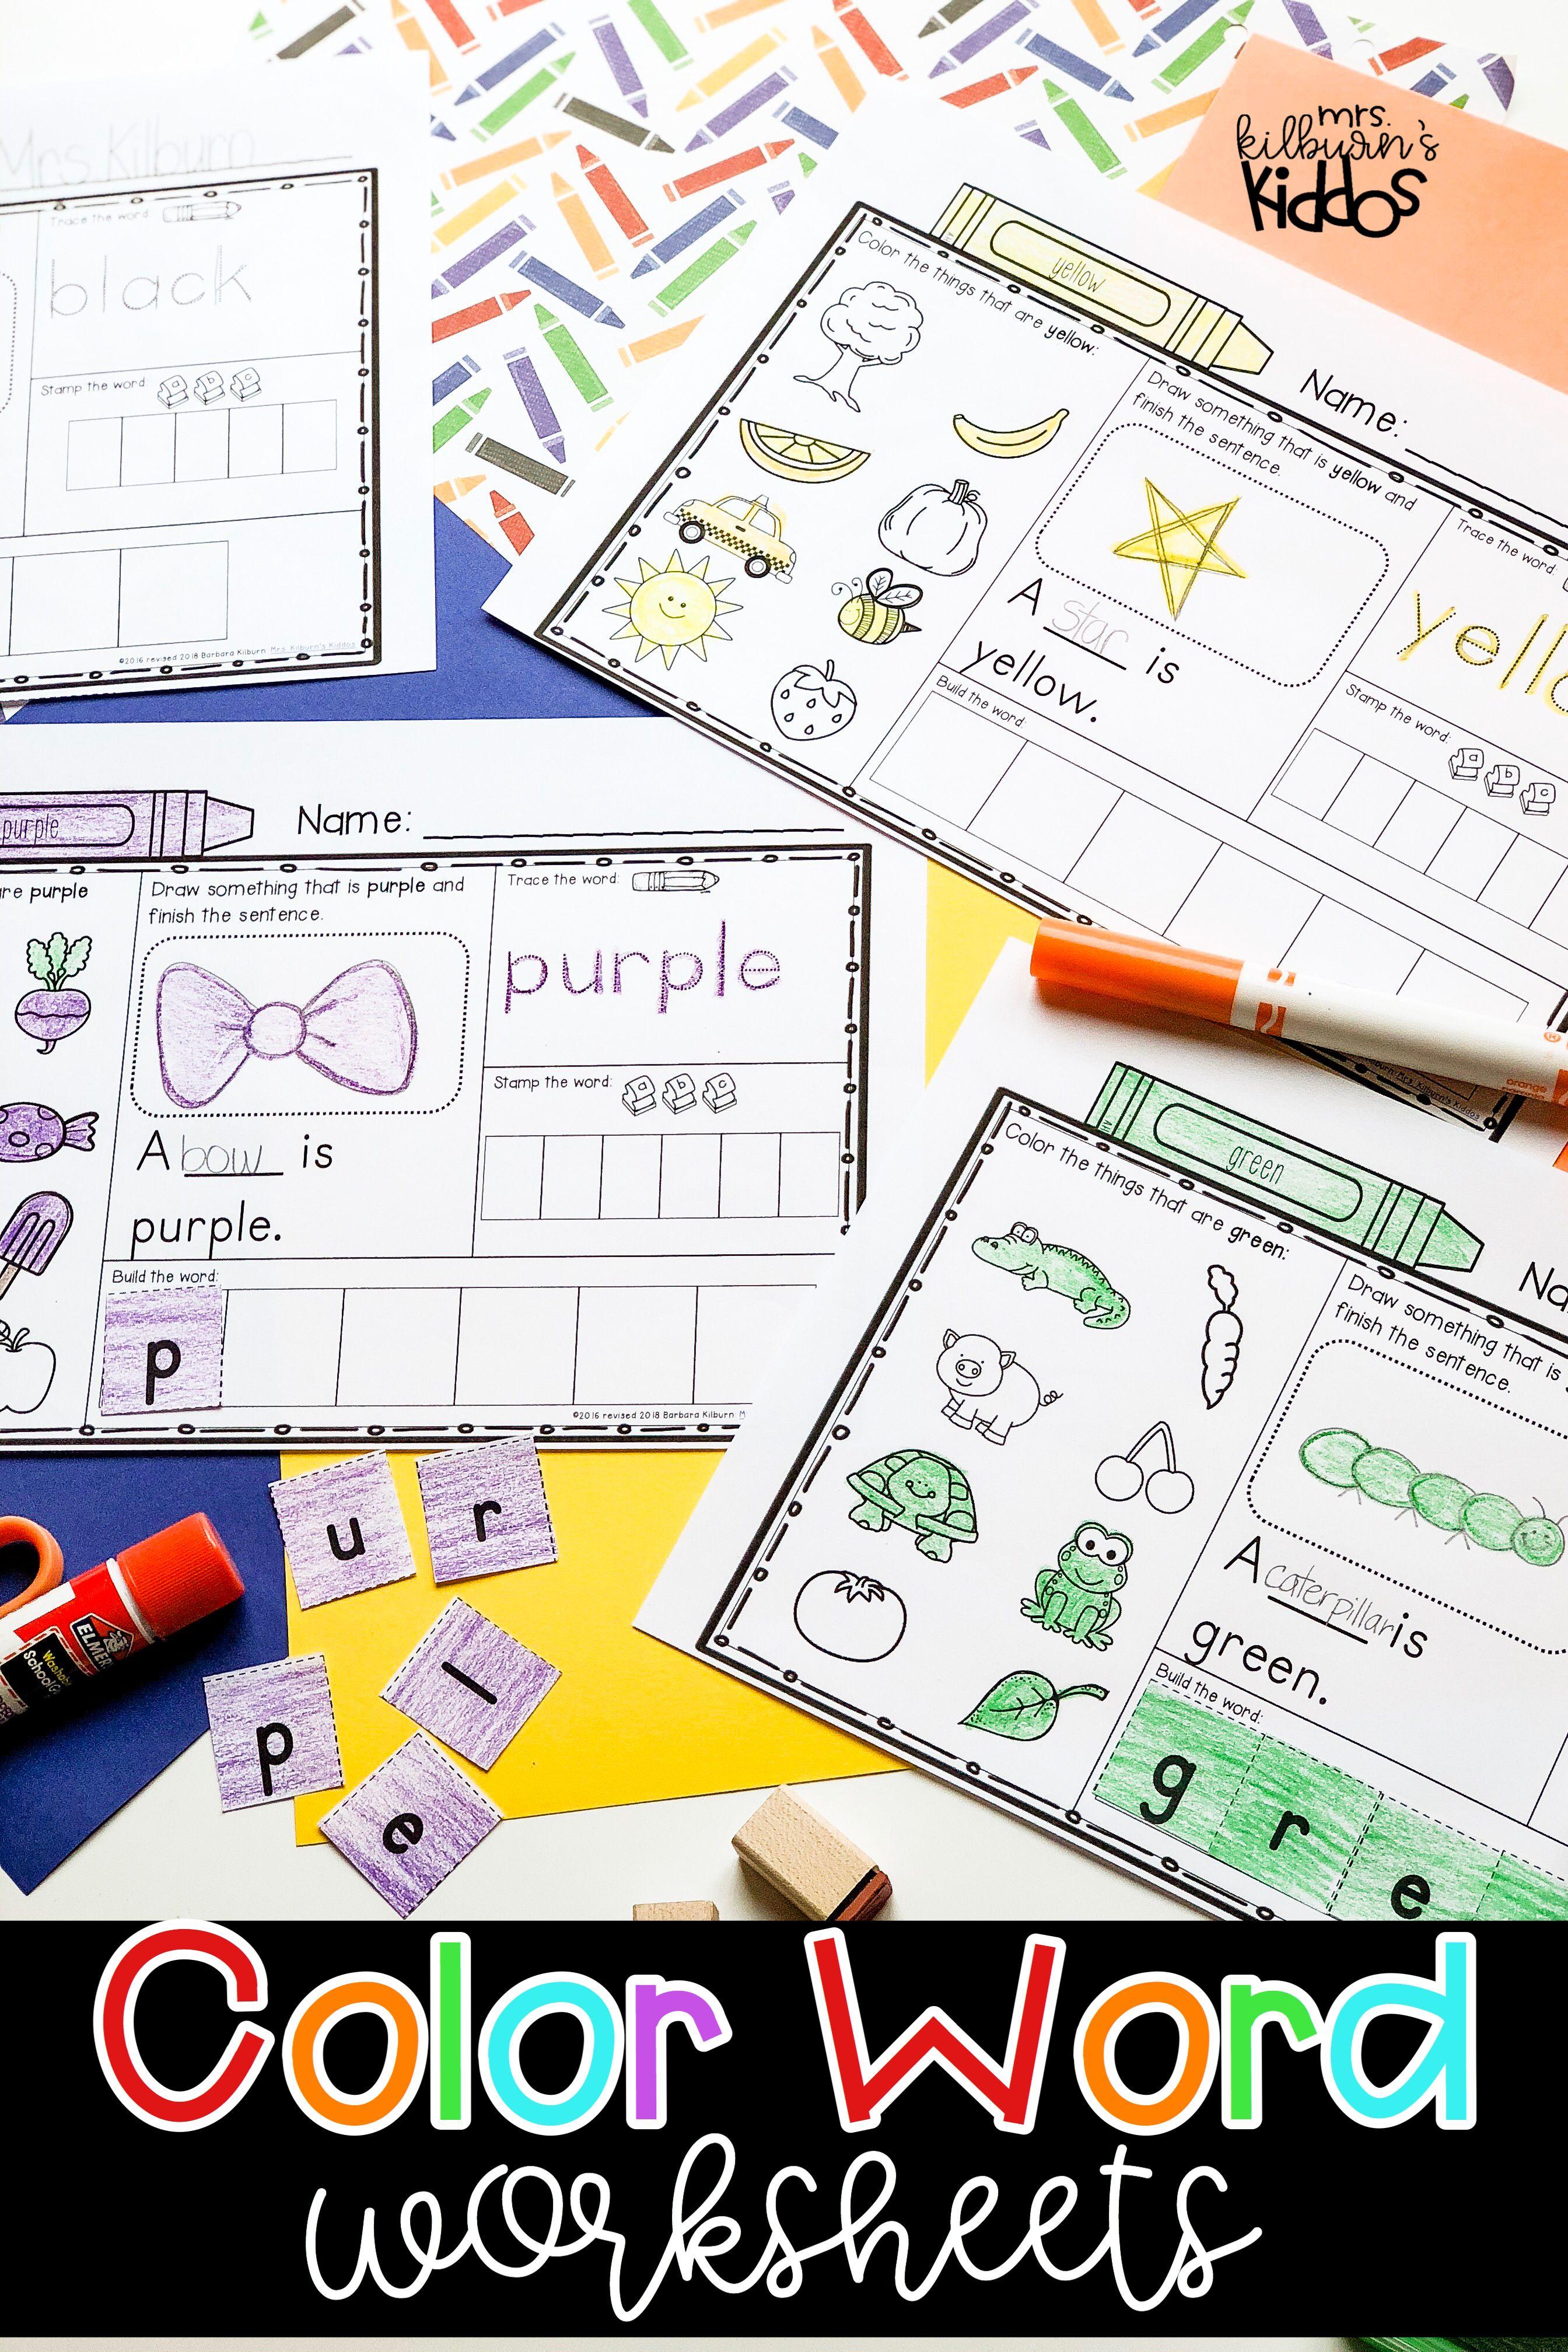 Color Word Worksheets